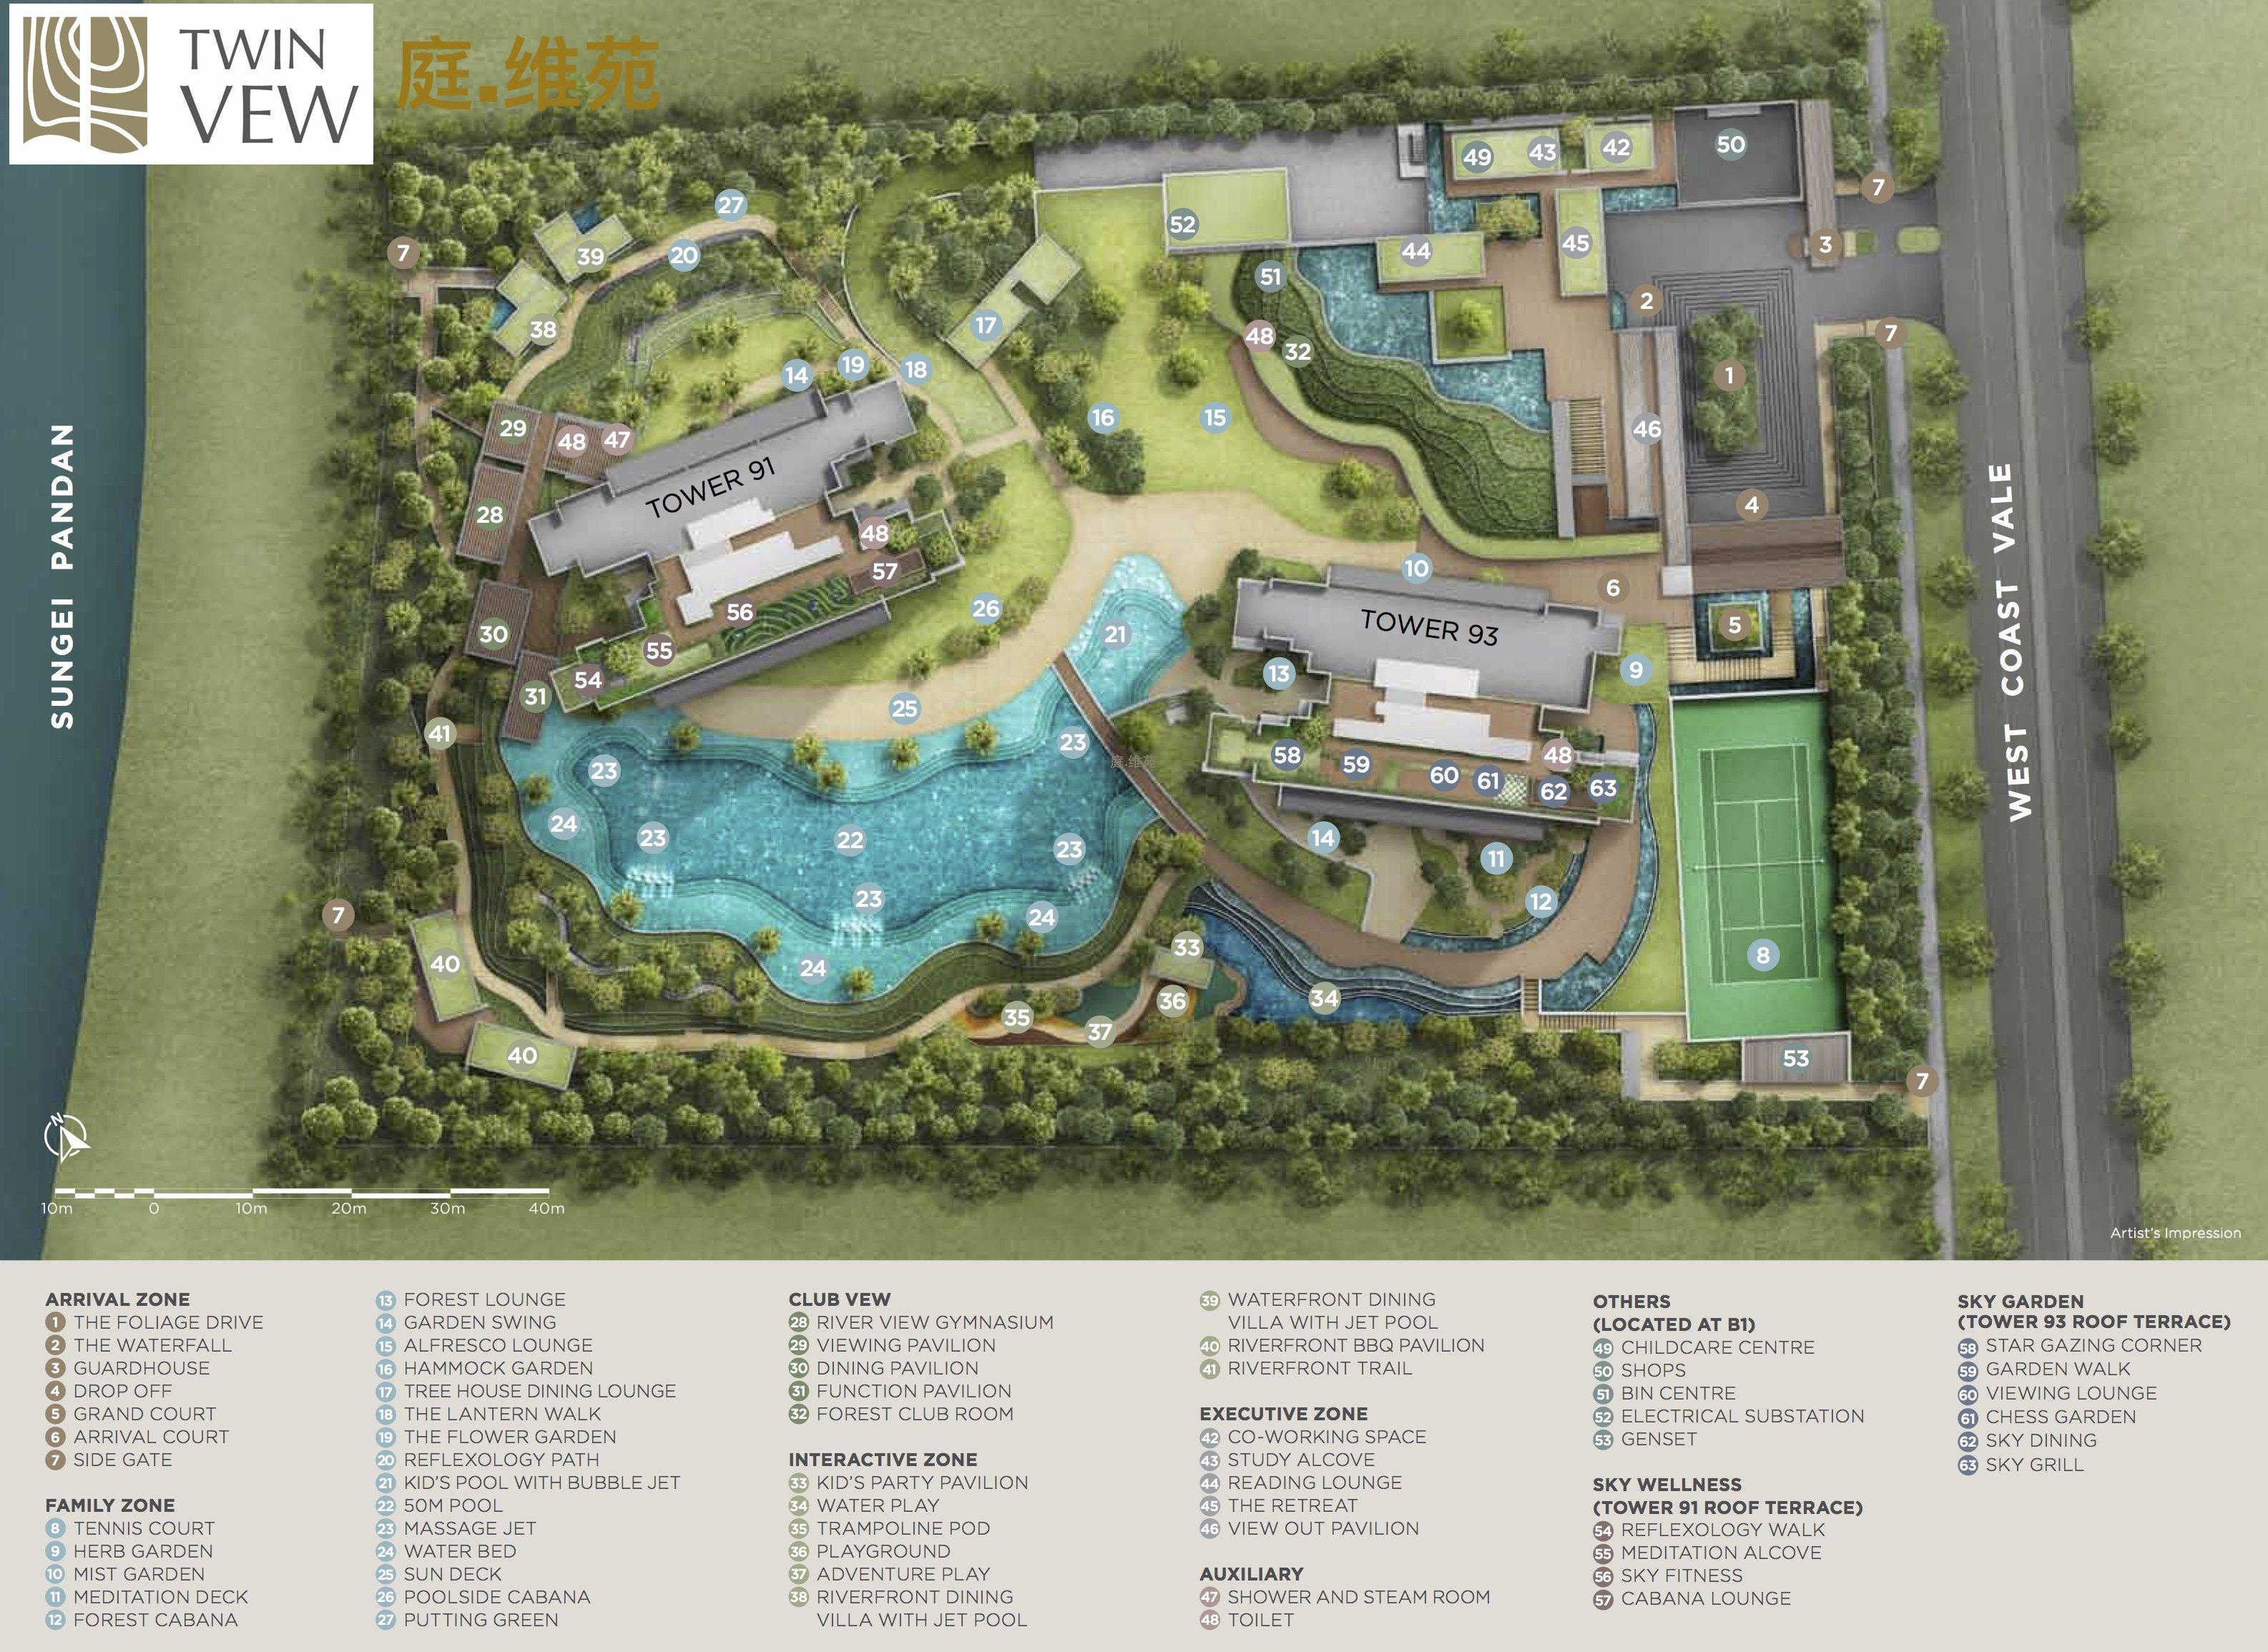 Twin VEW condo site plan with facilities